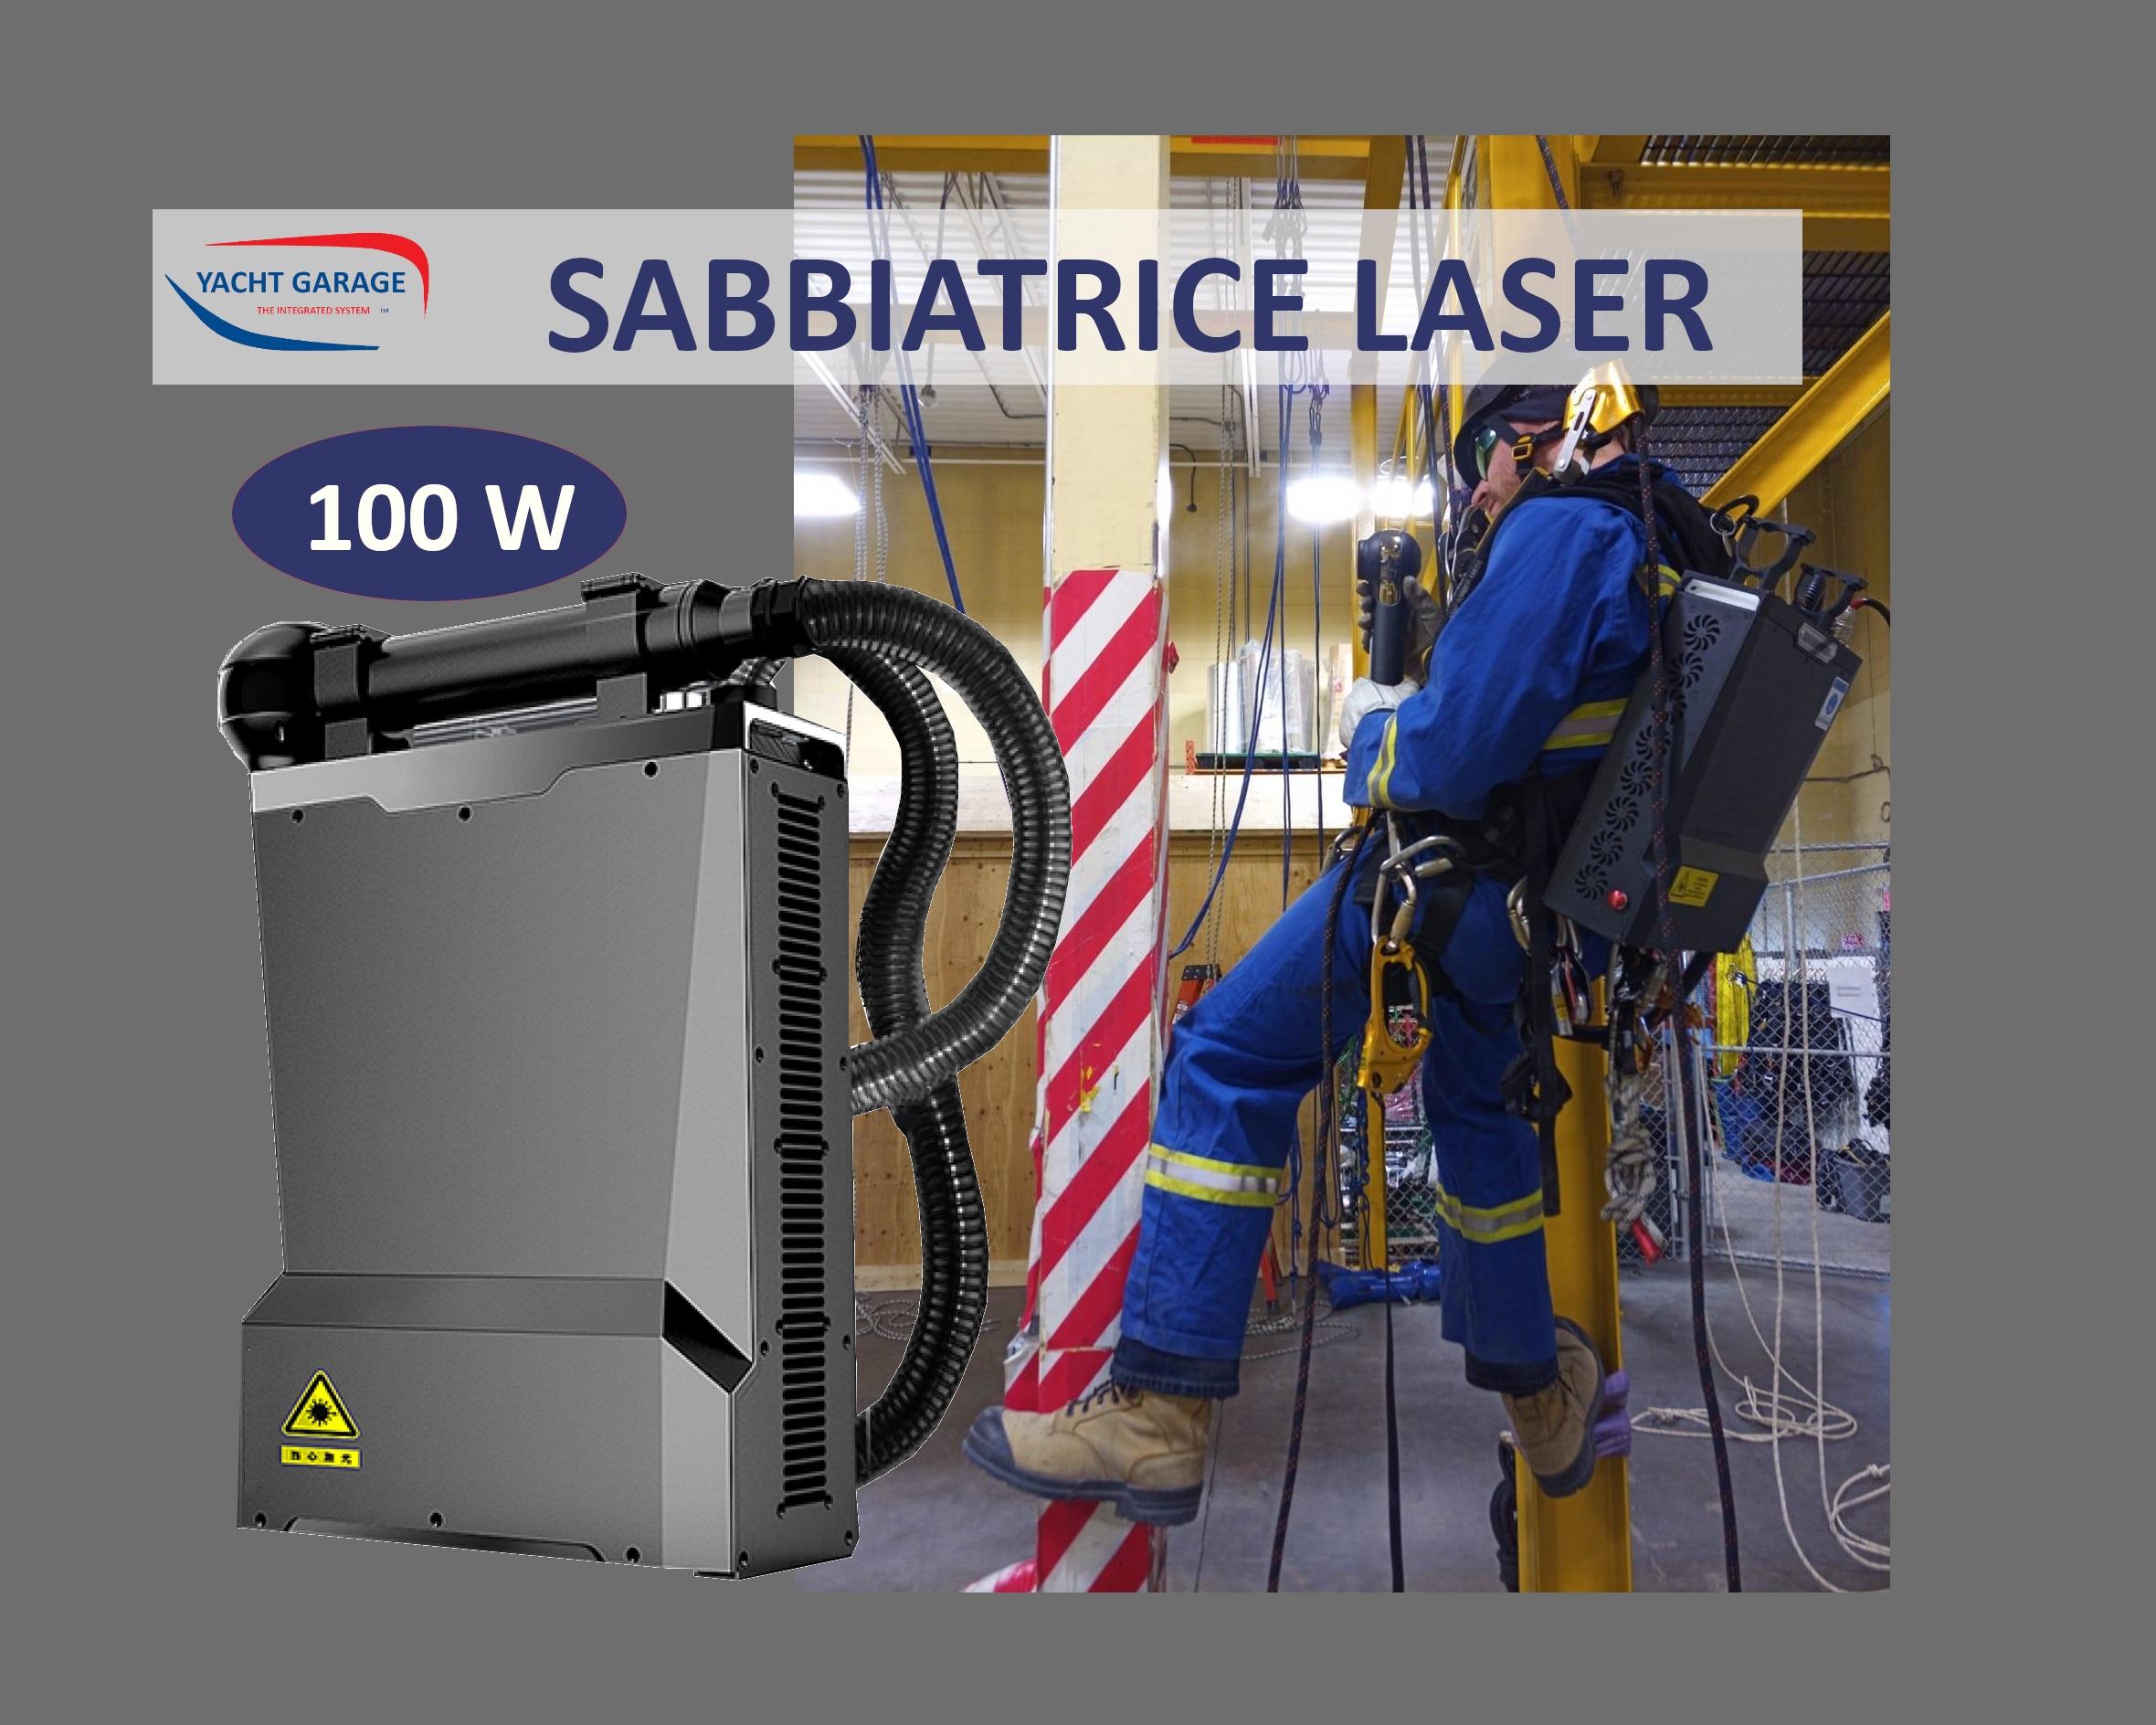 sabbiatrici laser portatili